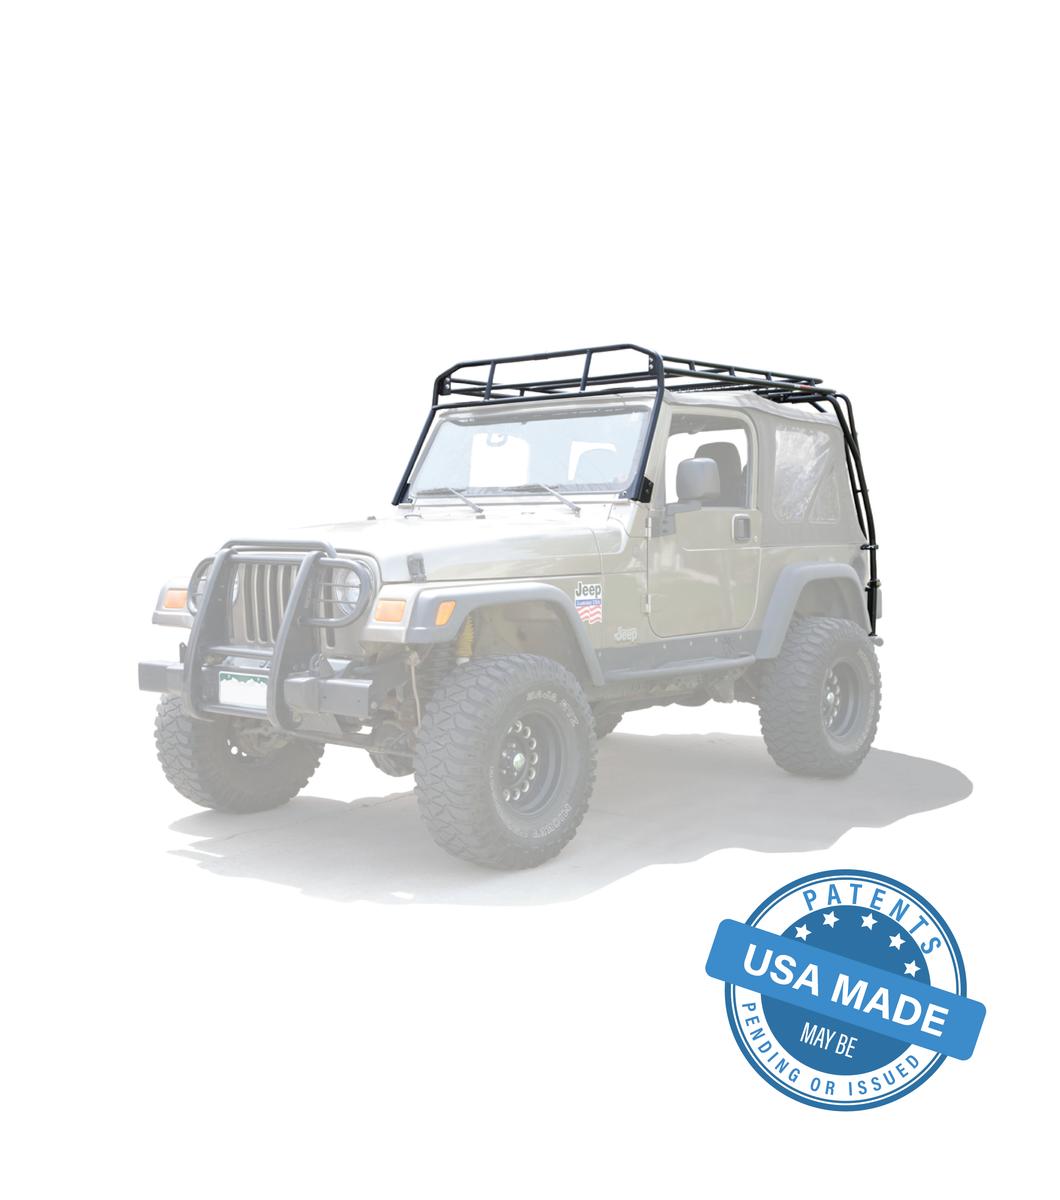 GOBI Jeep TJ Ranger Rack